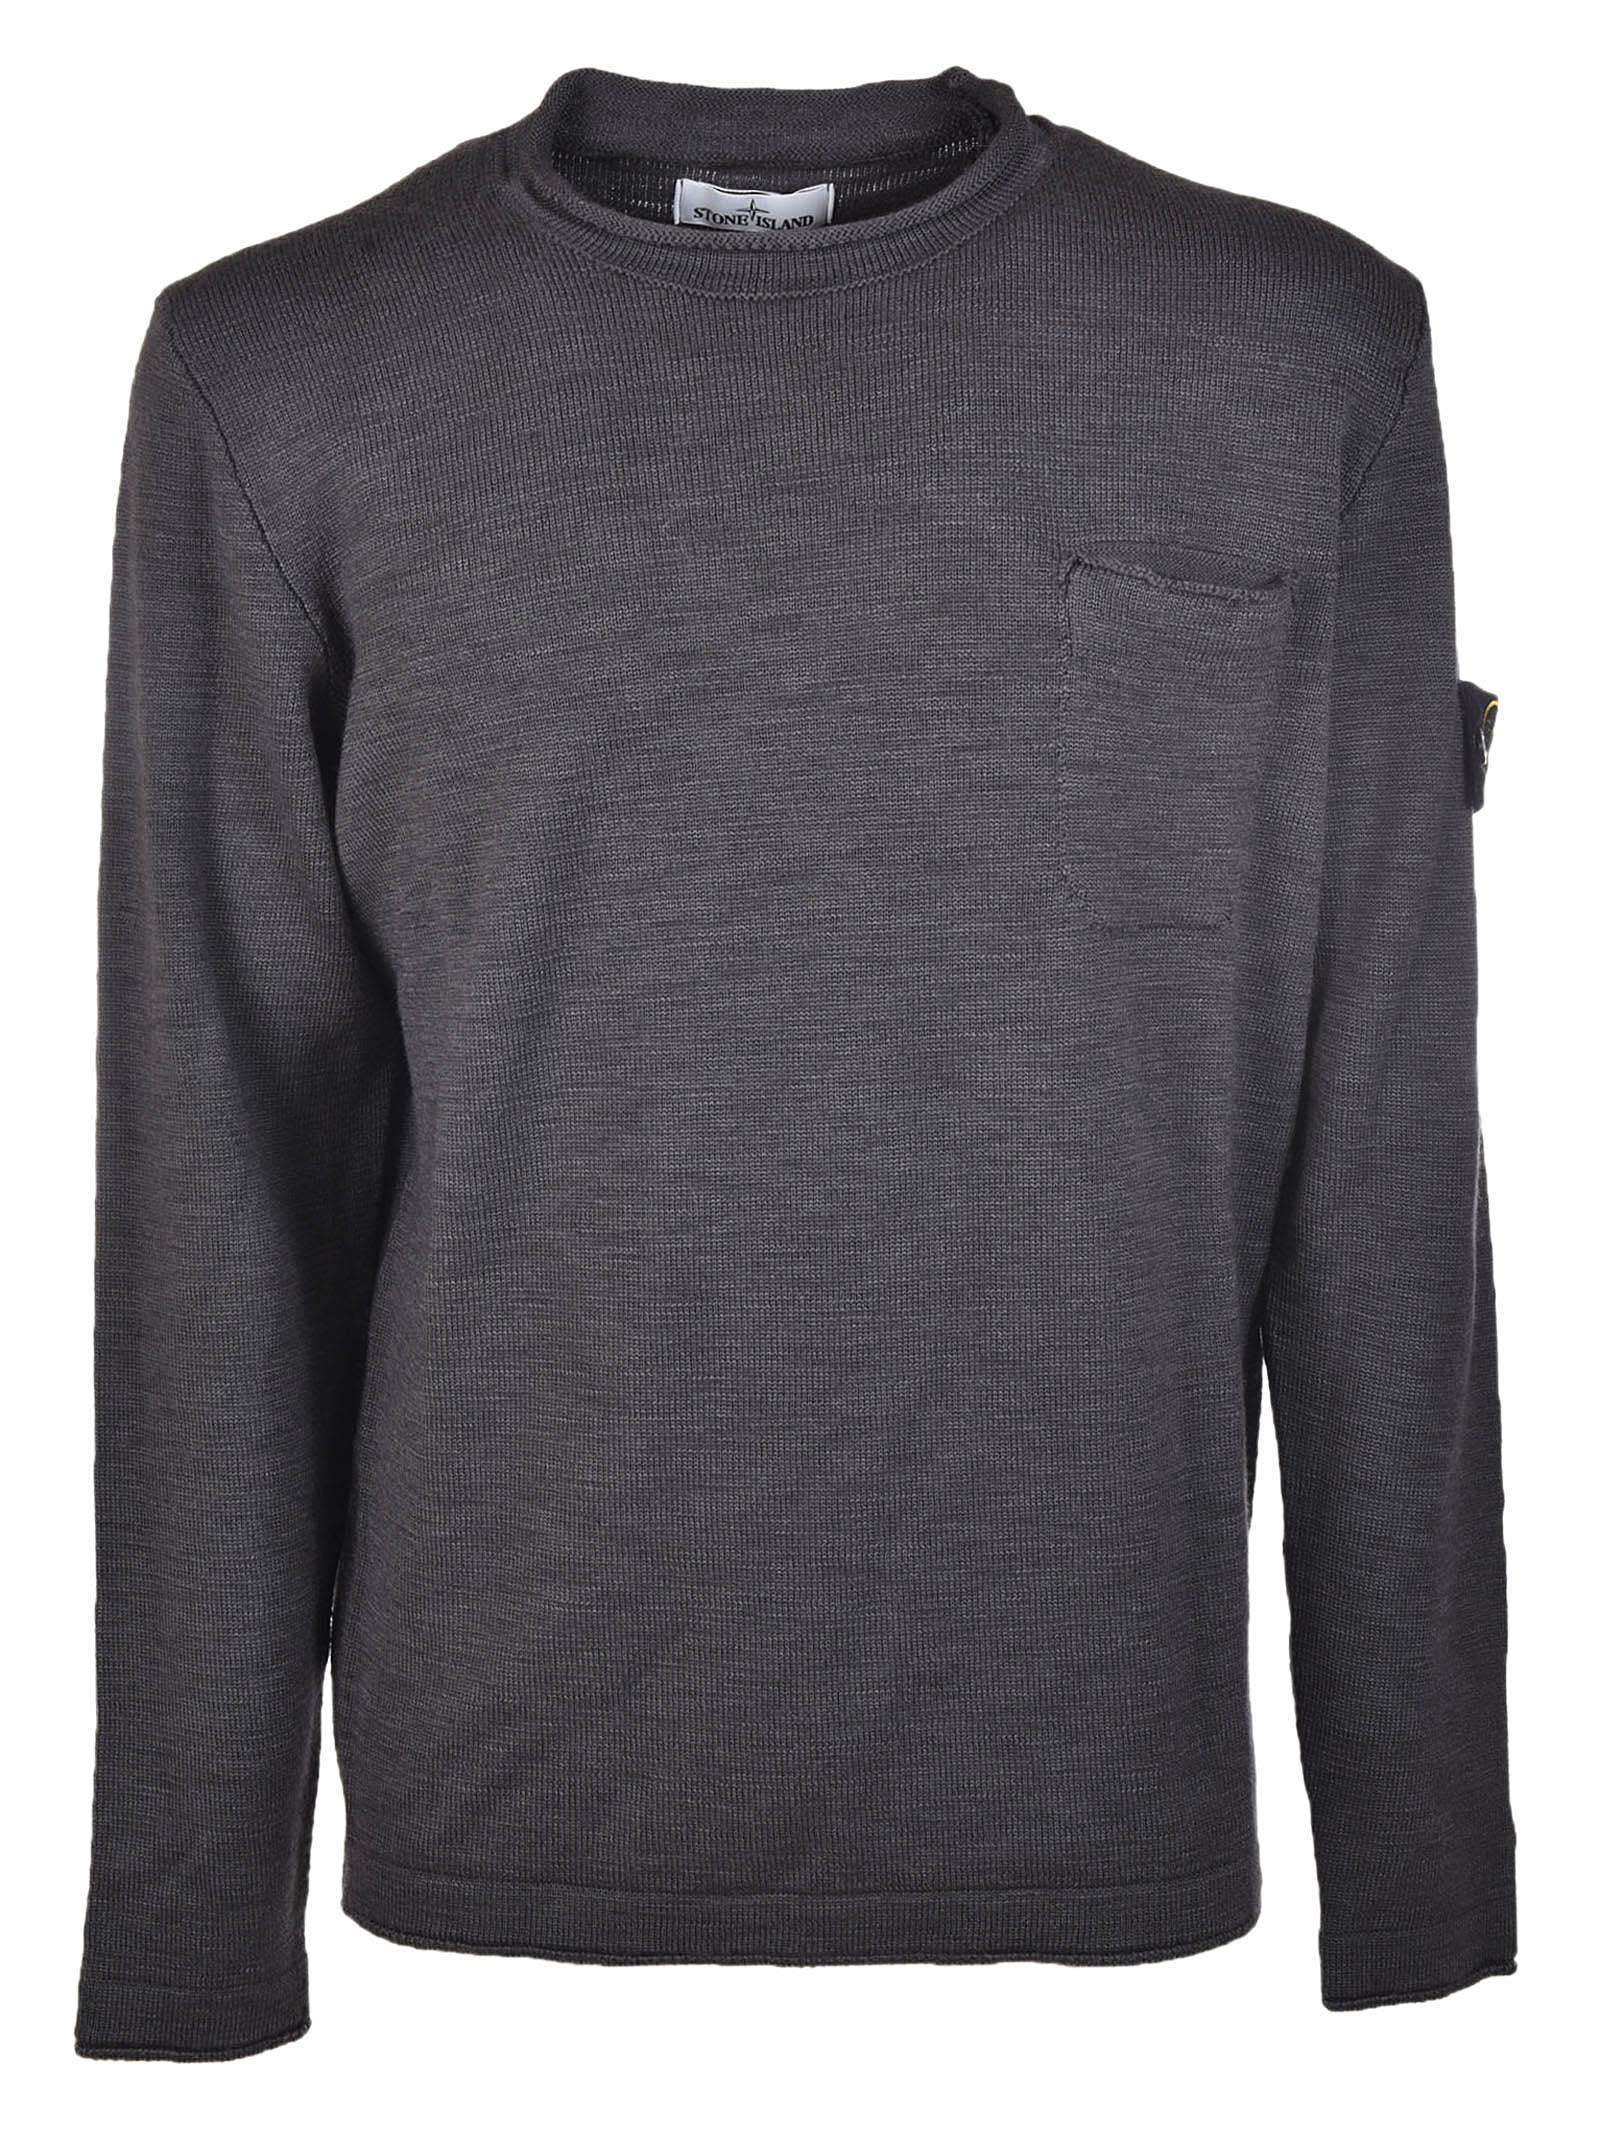 Stone Island Knitted Sweater